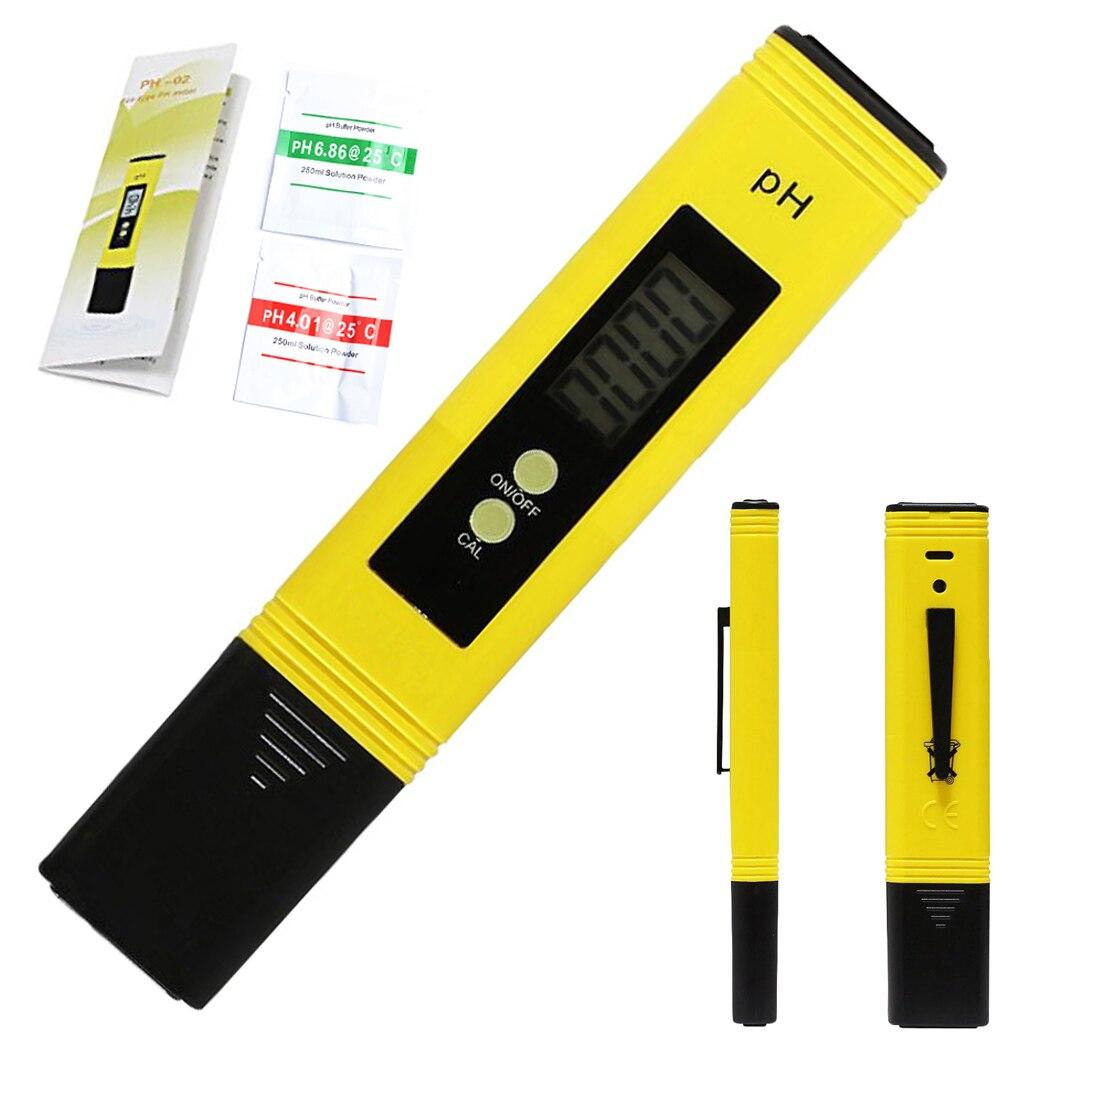 0.01 Digital PH Meter Tester for Water Quality Food Aquarium Pool Hydroponics Pocket Size PH Tester Large LCD Display